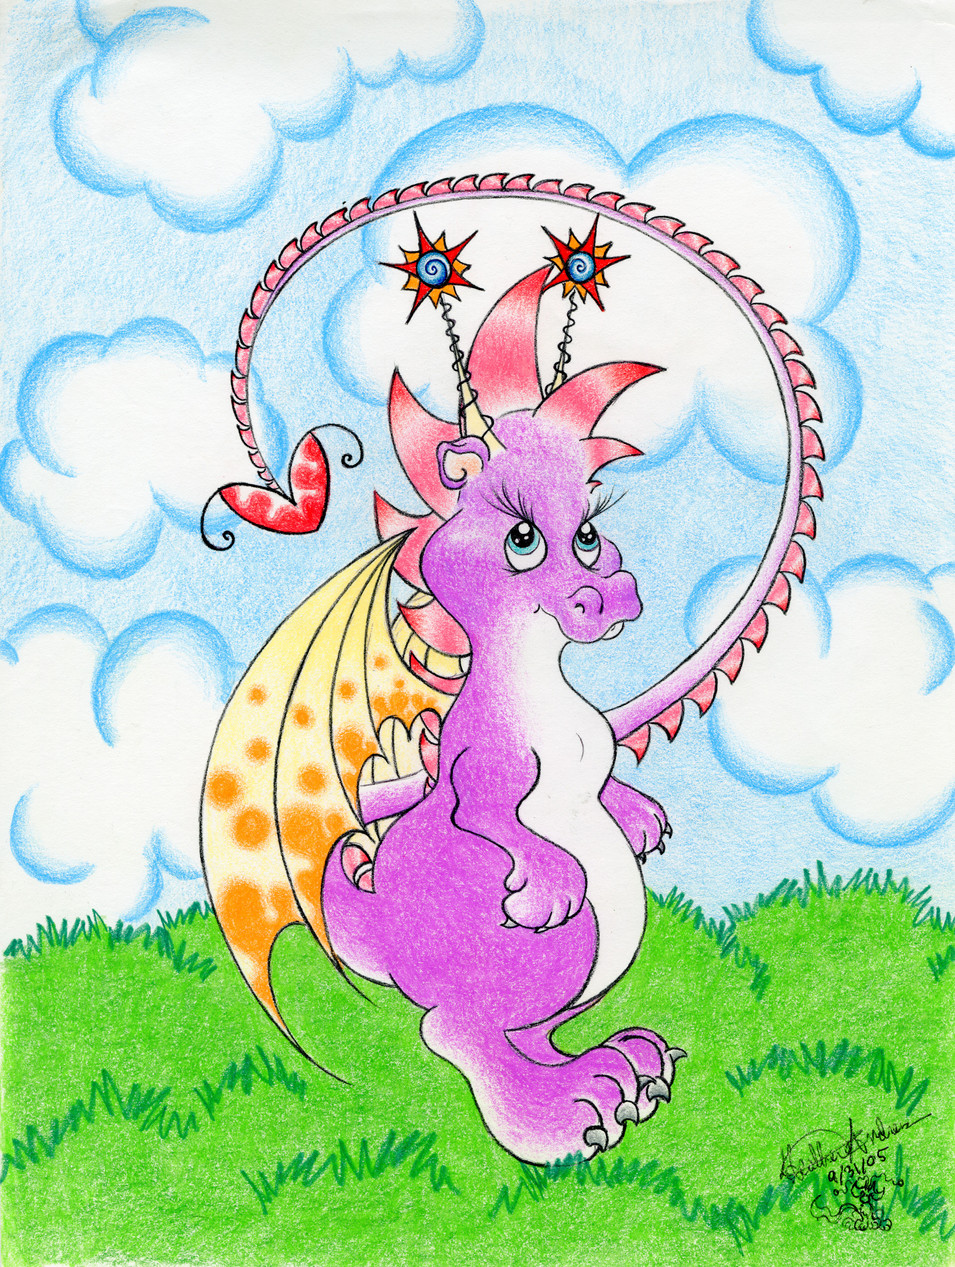 Purple_dragon_9-31-05(small).jpg